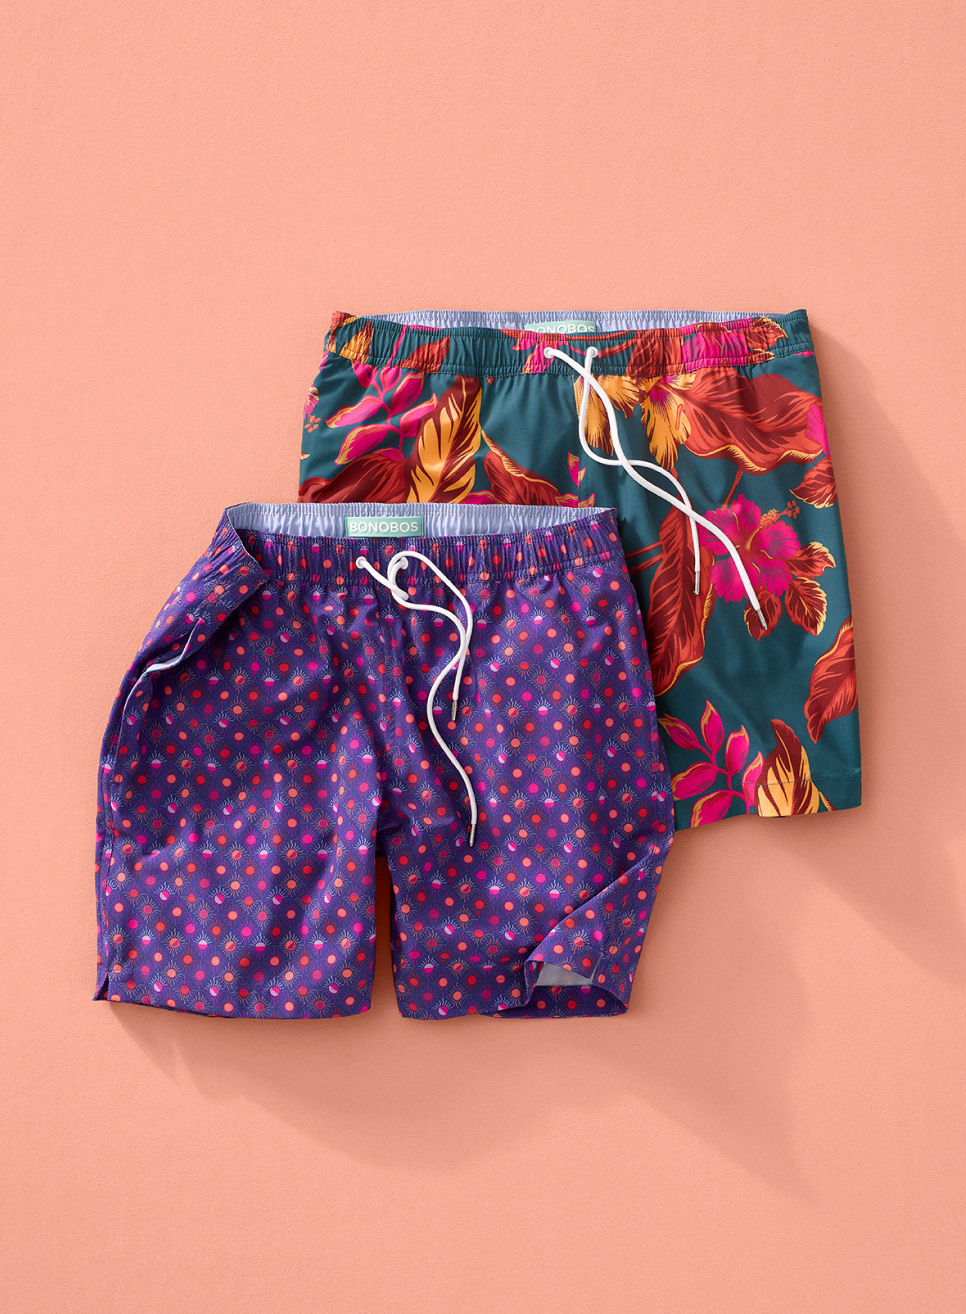 image of two swim trunks